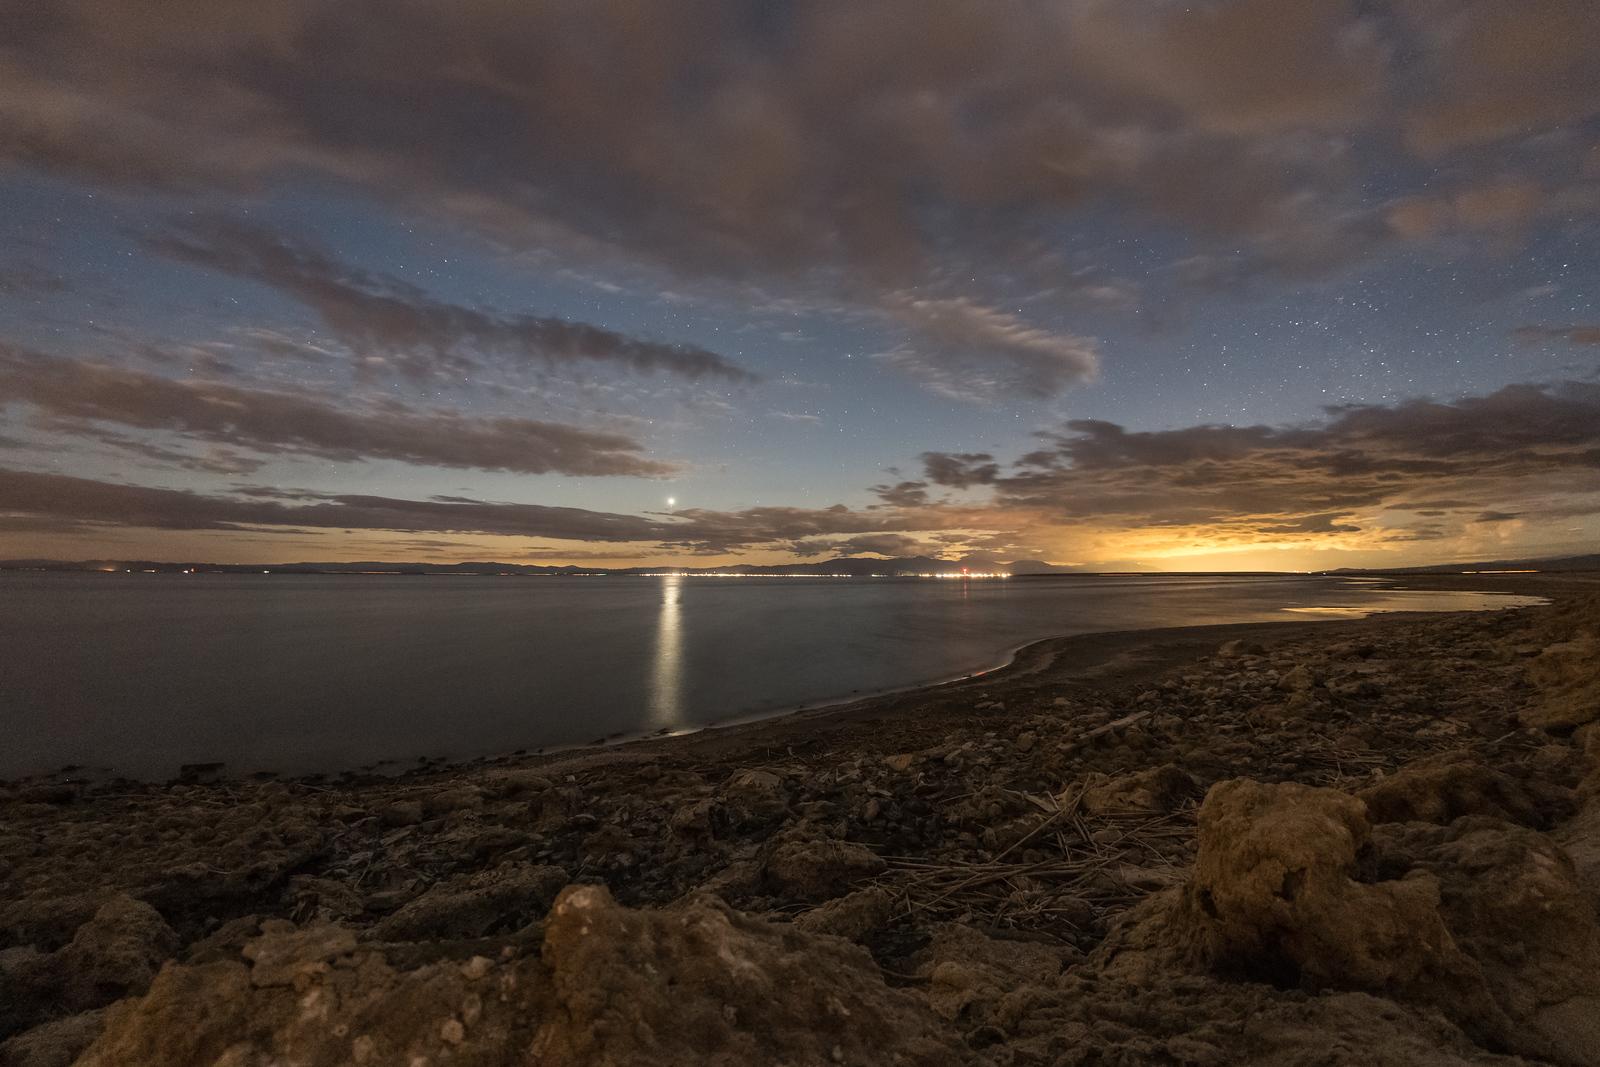 Saturday night at the Salton Sea.